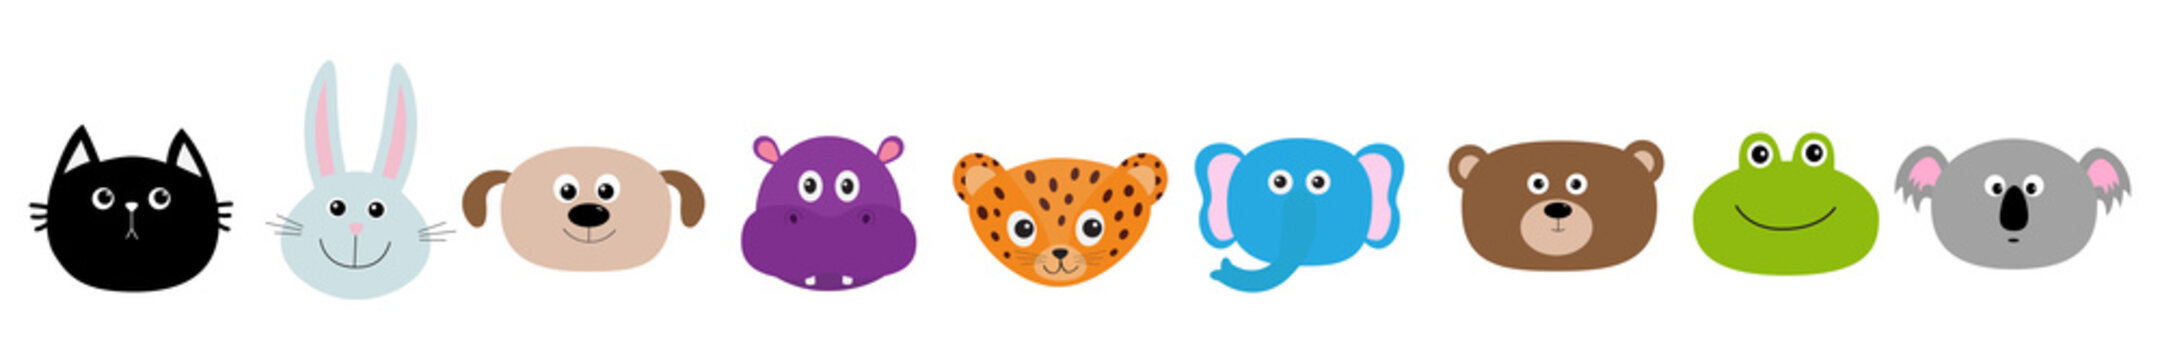 Zoo animal head face set. Cute cartoon character Baby children education. Cat, rabbit, hare, jaguar, dog, hippopotamus elephant, bear, frog koala. Flat design. White background Isolated